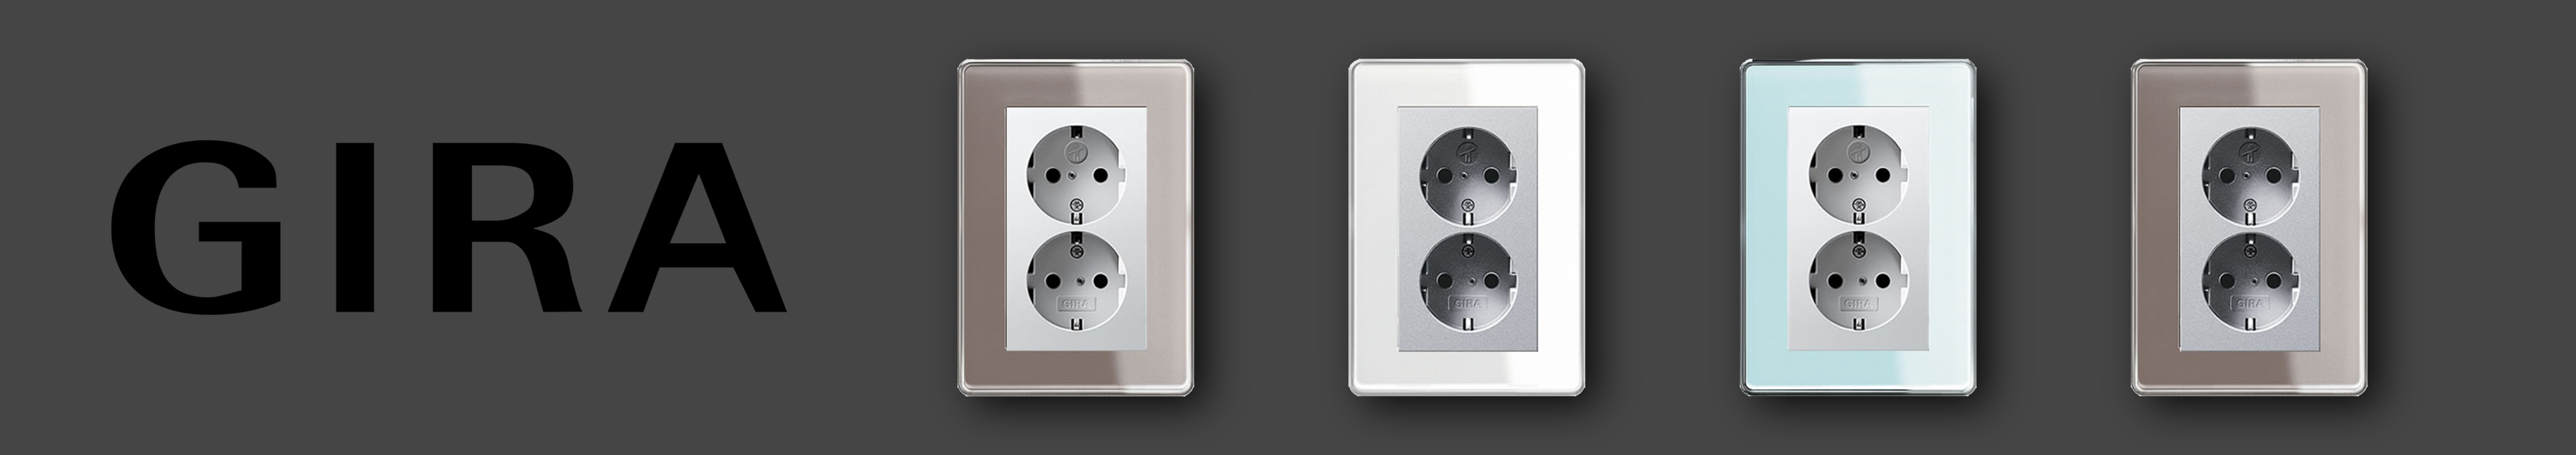 dubbele stopcontacten ovale doos gira esprit glas. Black Bedroom Furniture Sets. Home Design Ideas